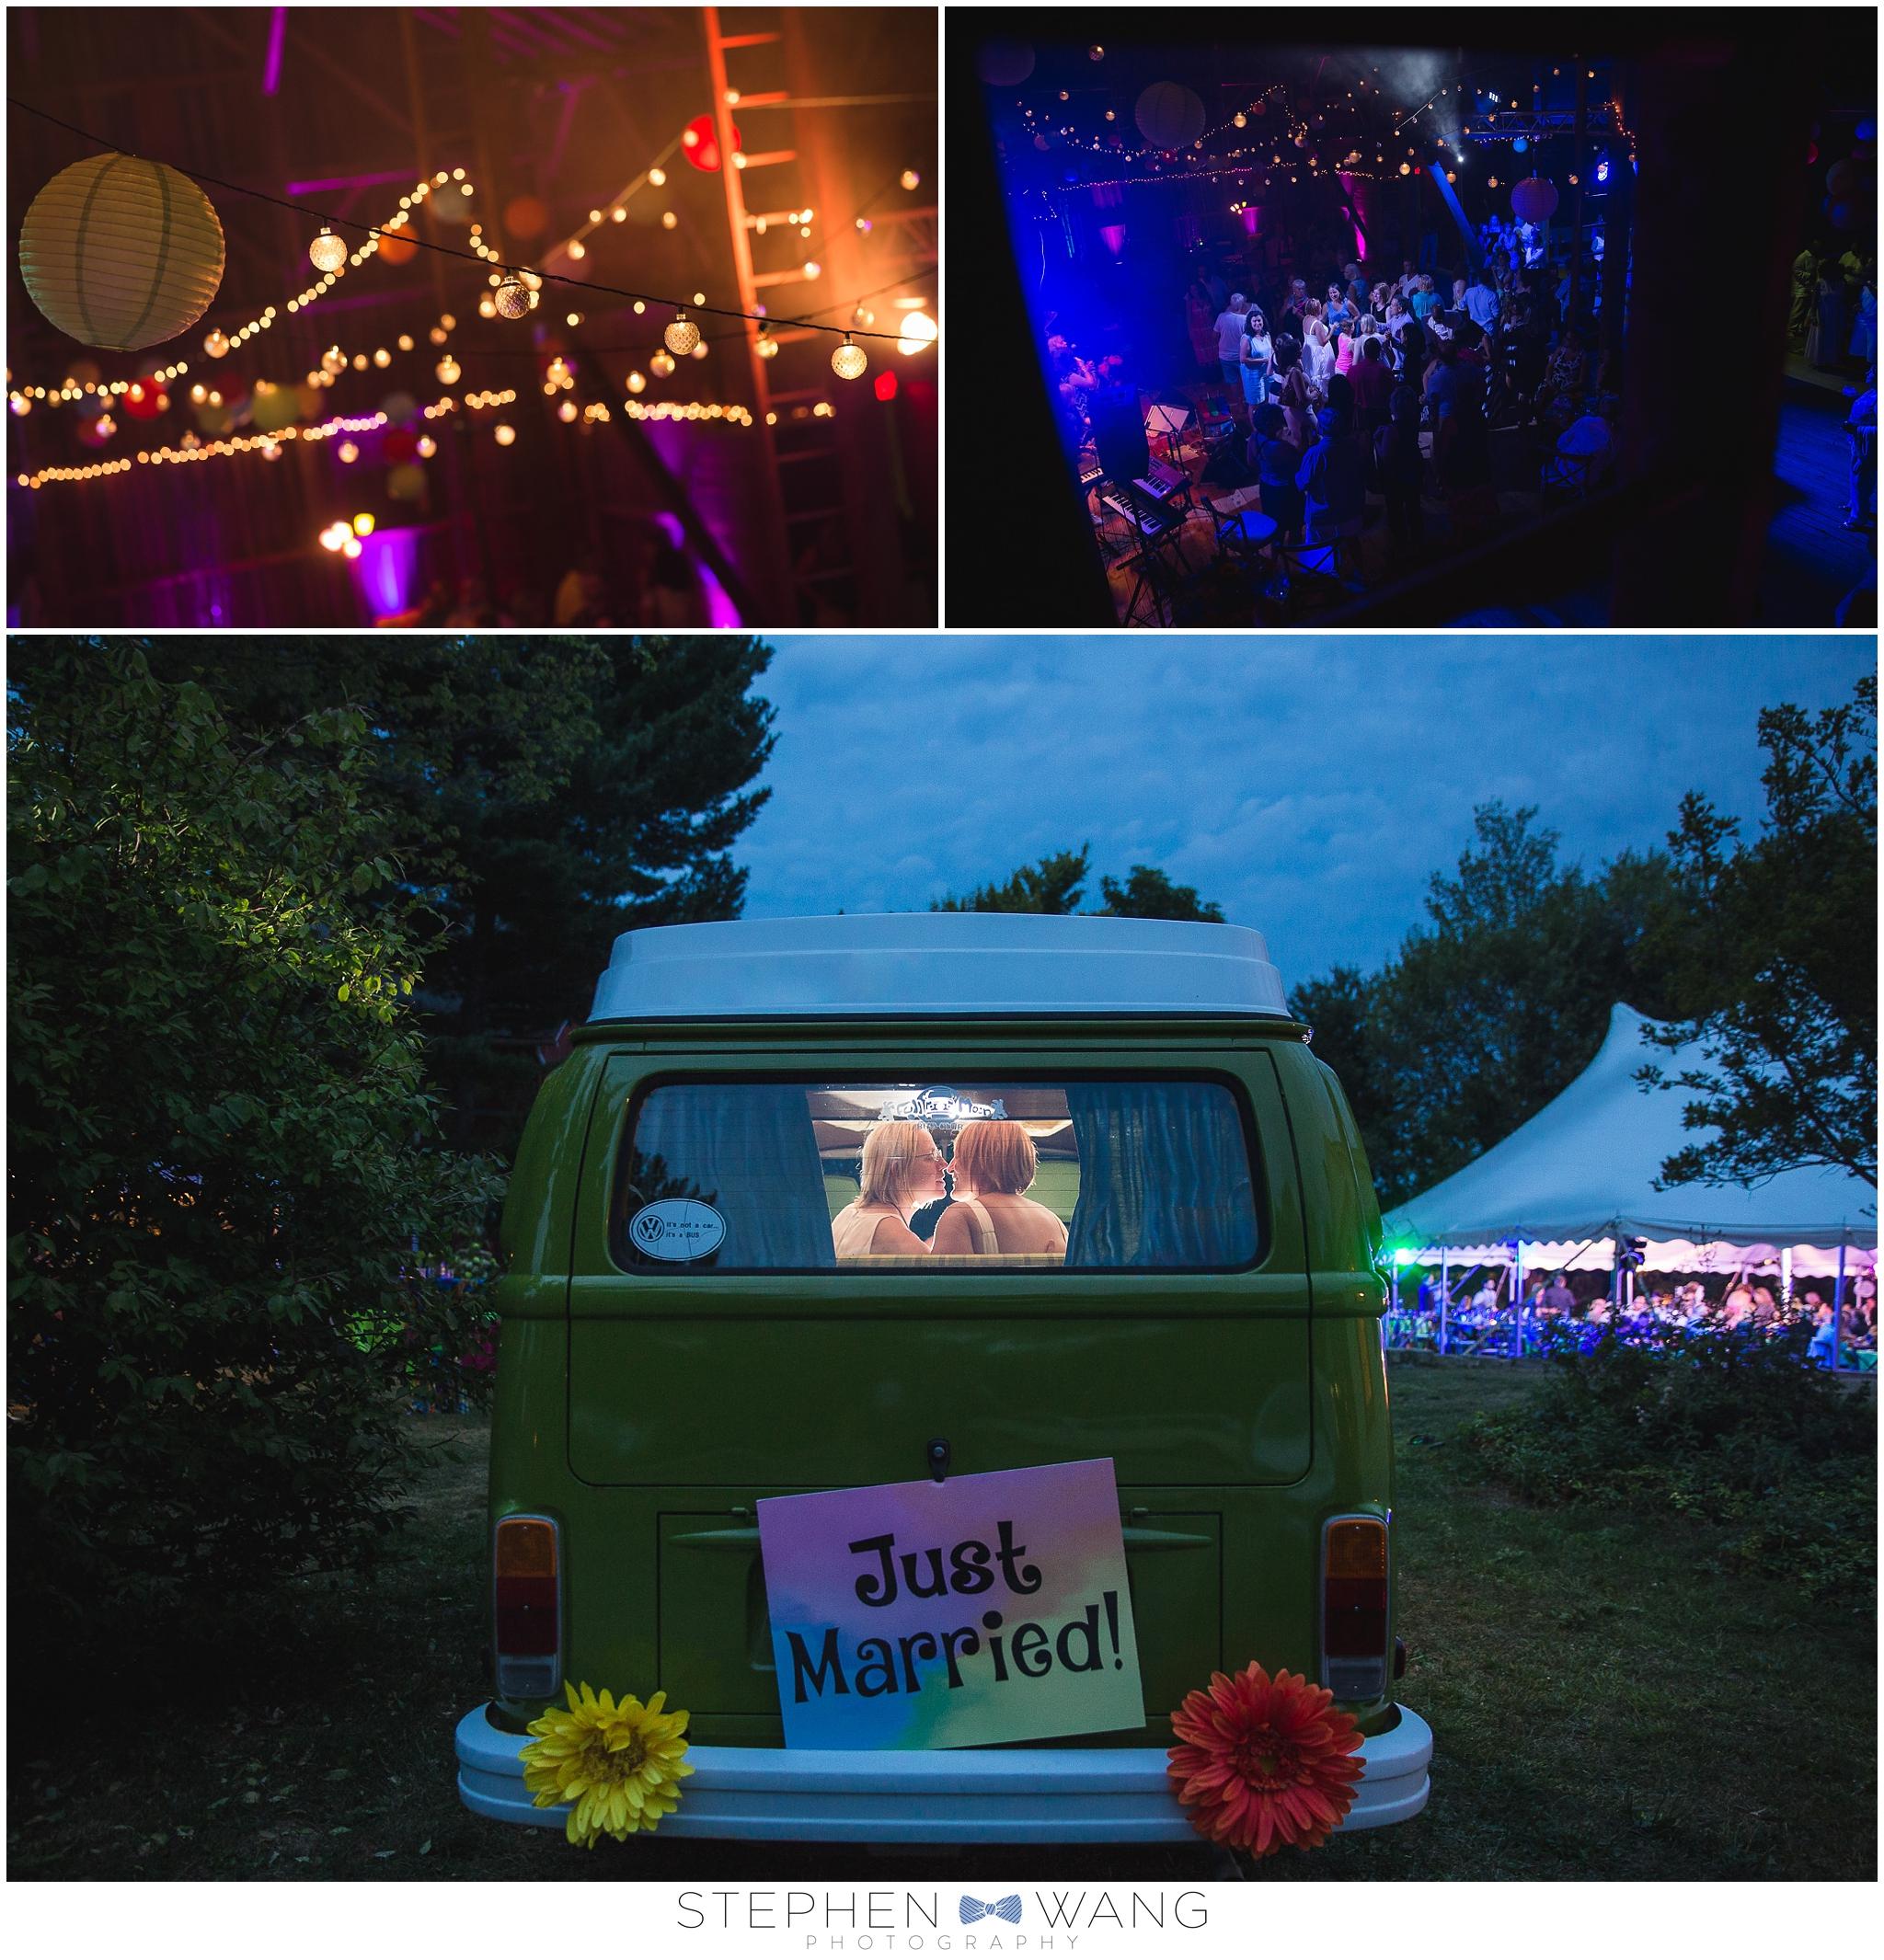 Stephen Wang Photography Wedding Photographer Connecticut CT-12-24_0020.jpg